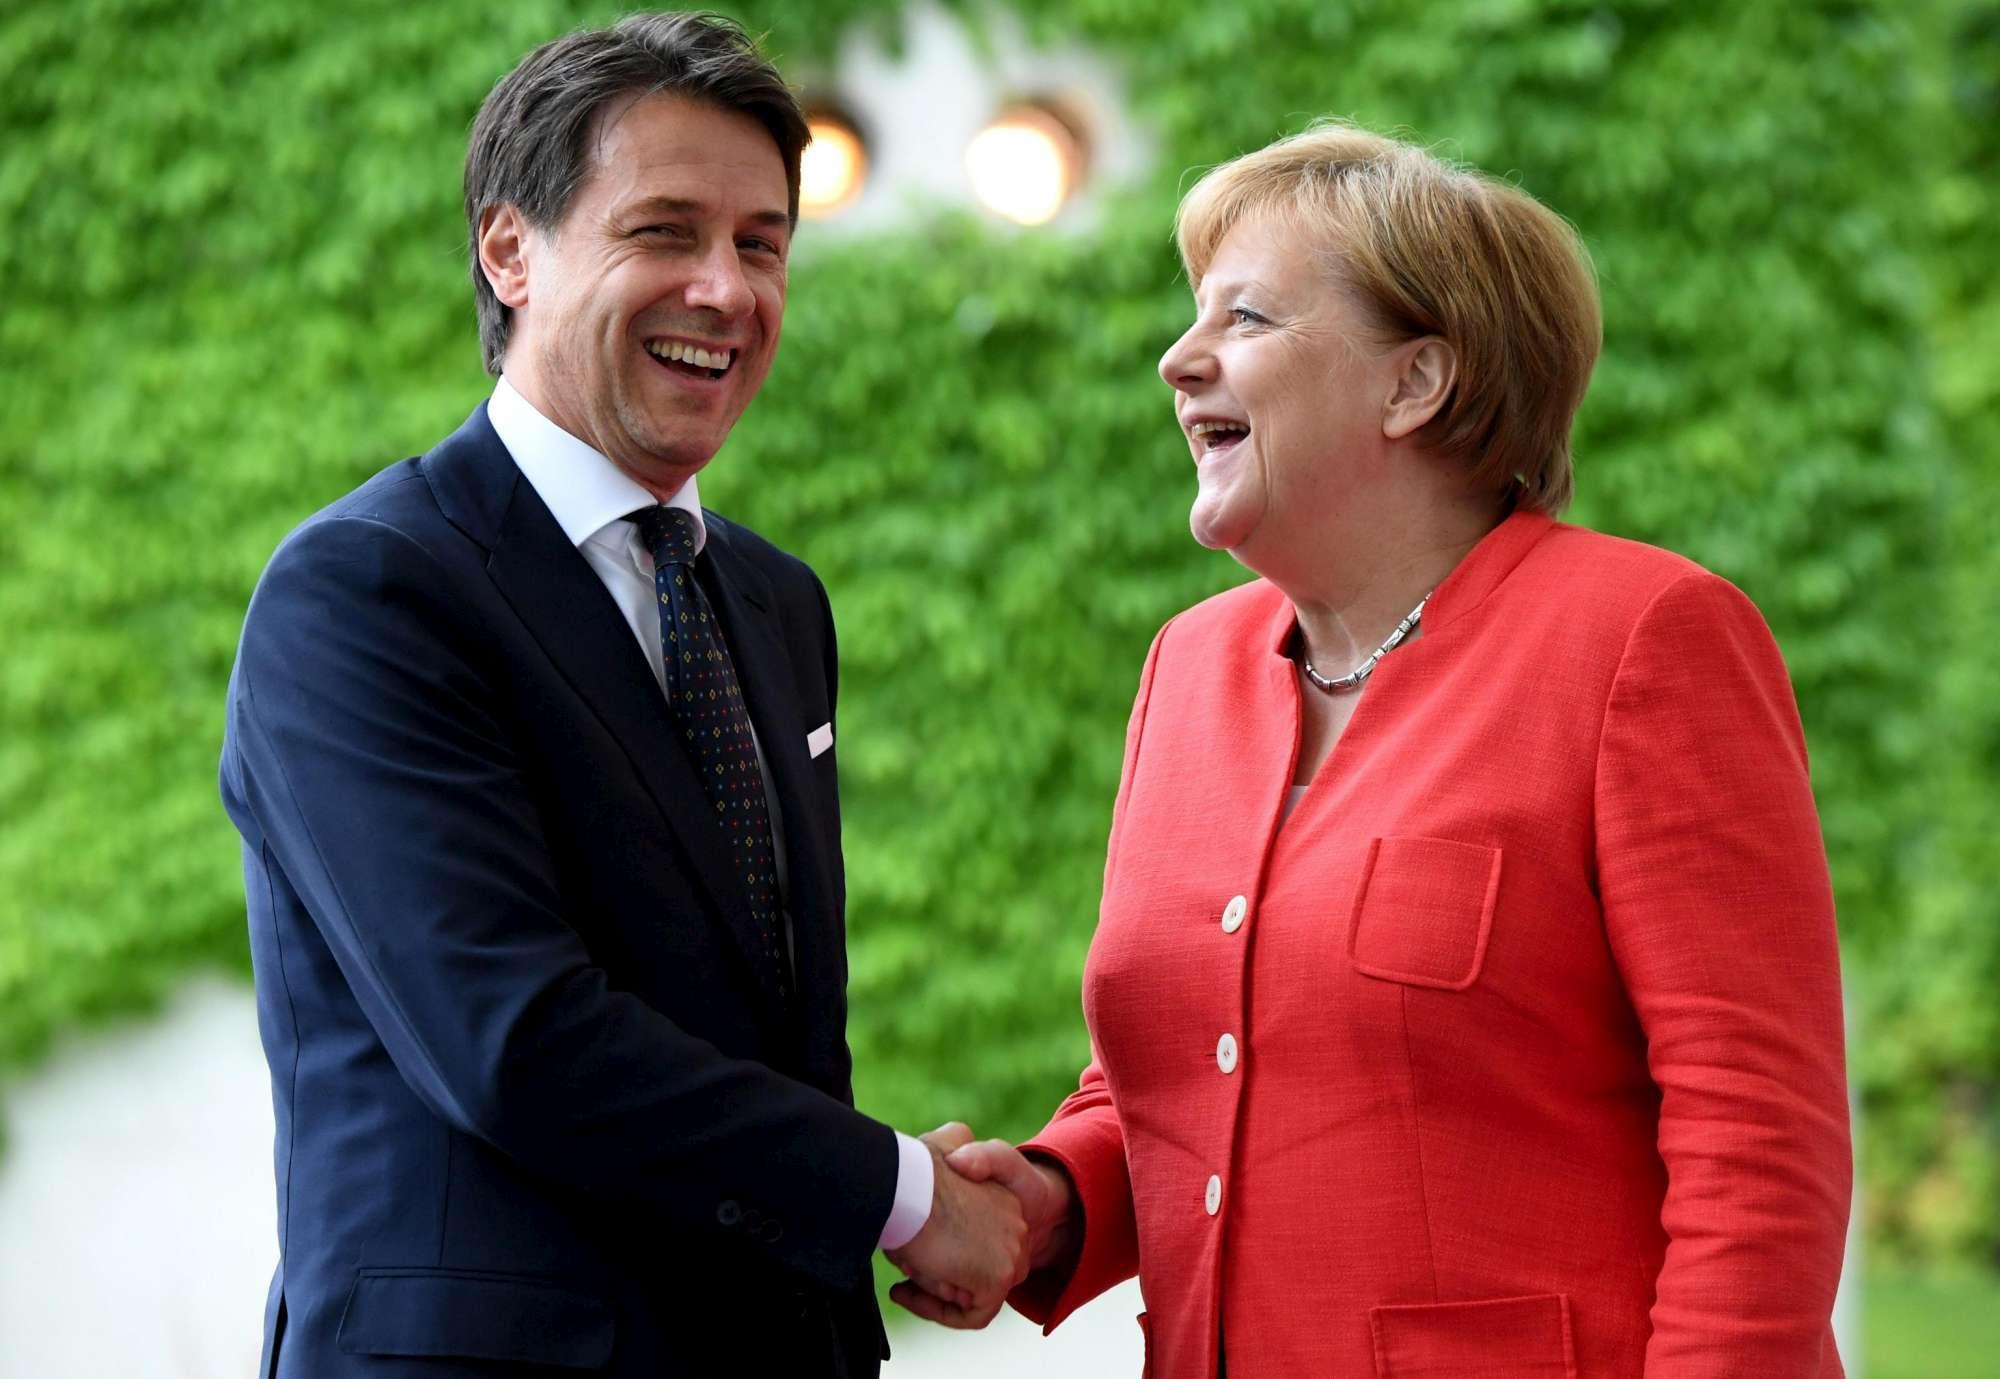 Berlino, vertice tra Giuseppe Conte e Angela Merkel: focus sui migranti